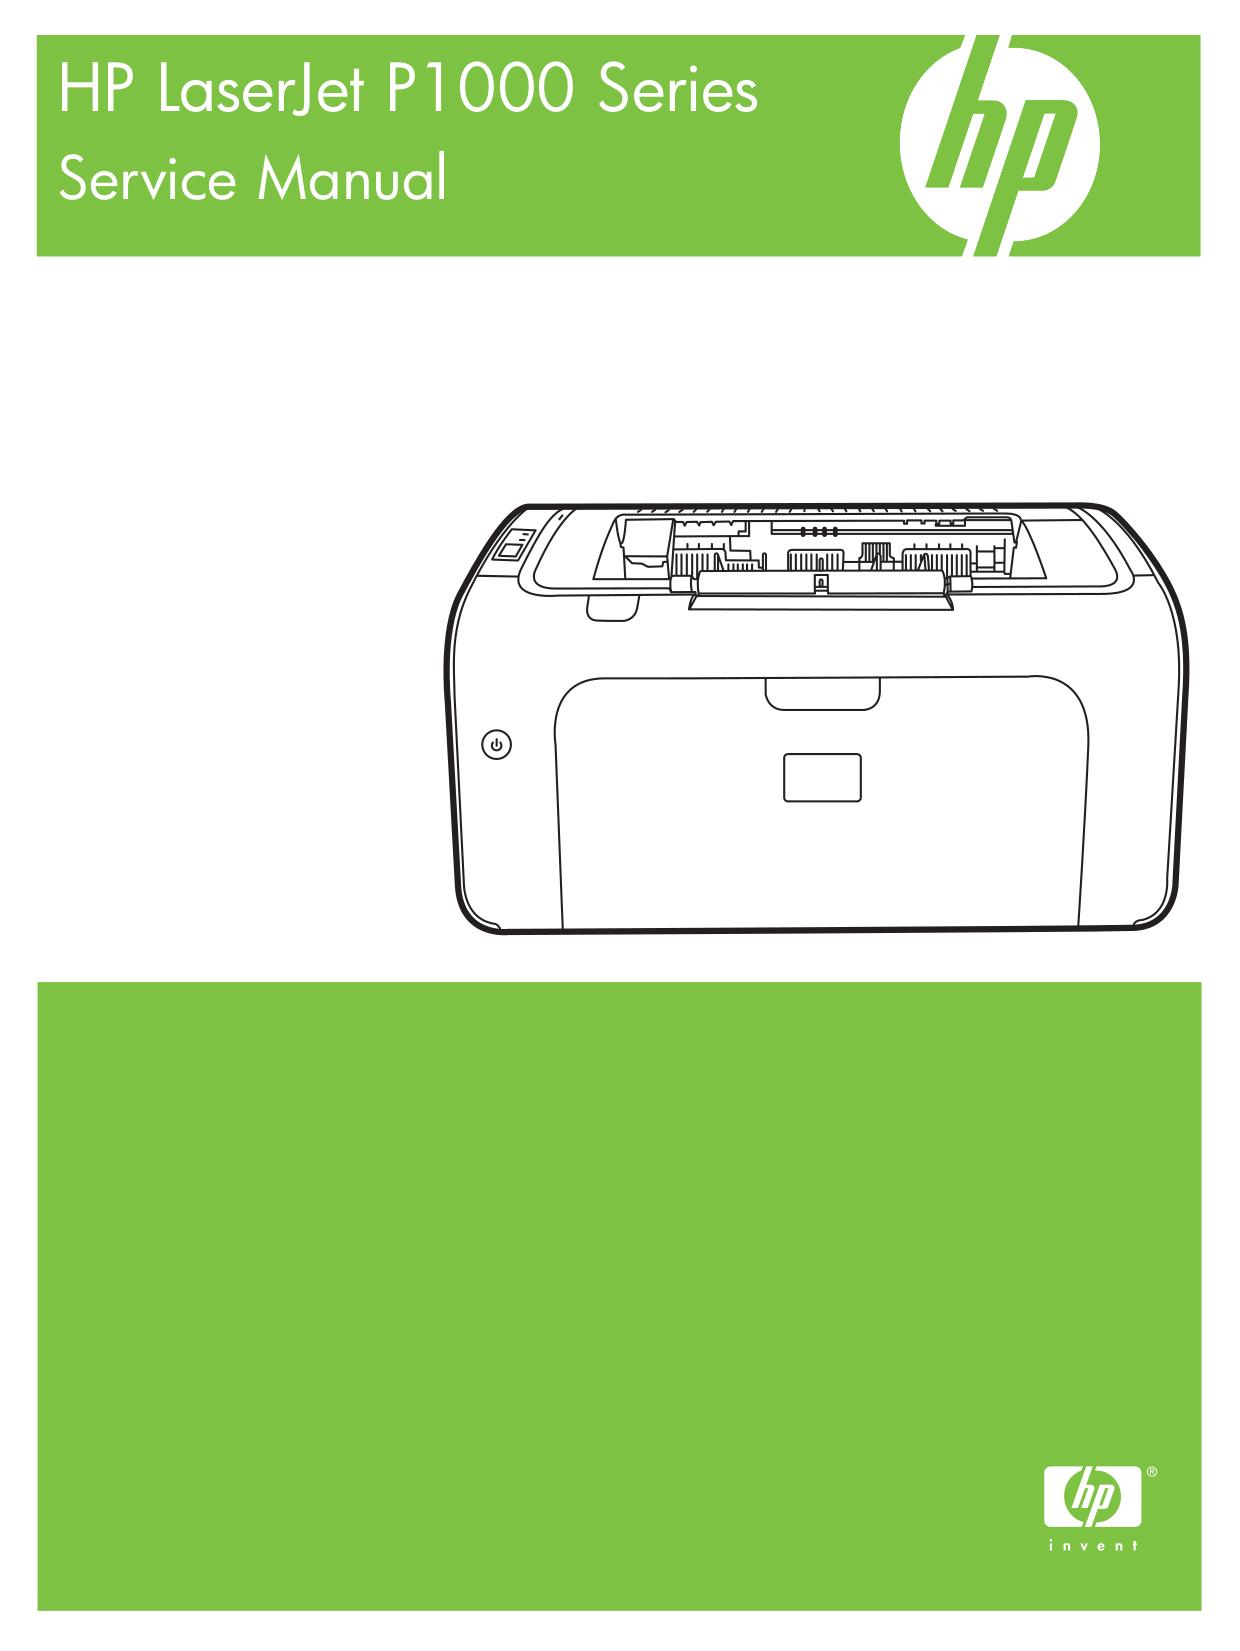 HP LaserJet P Driver Software and Manual Download